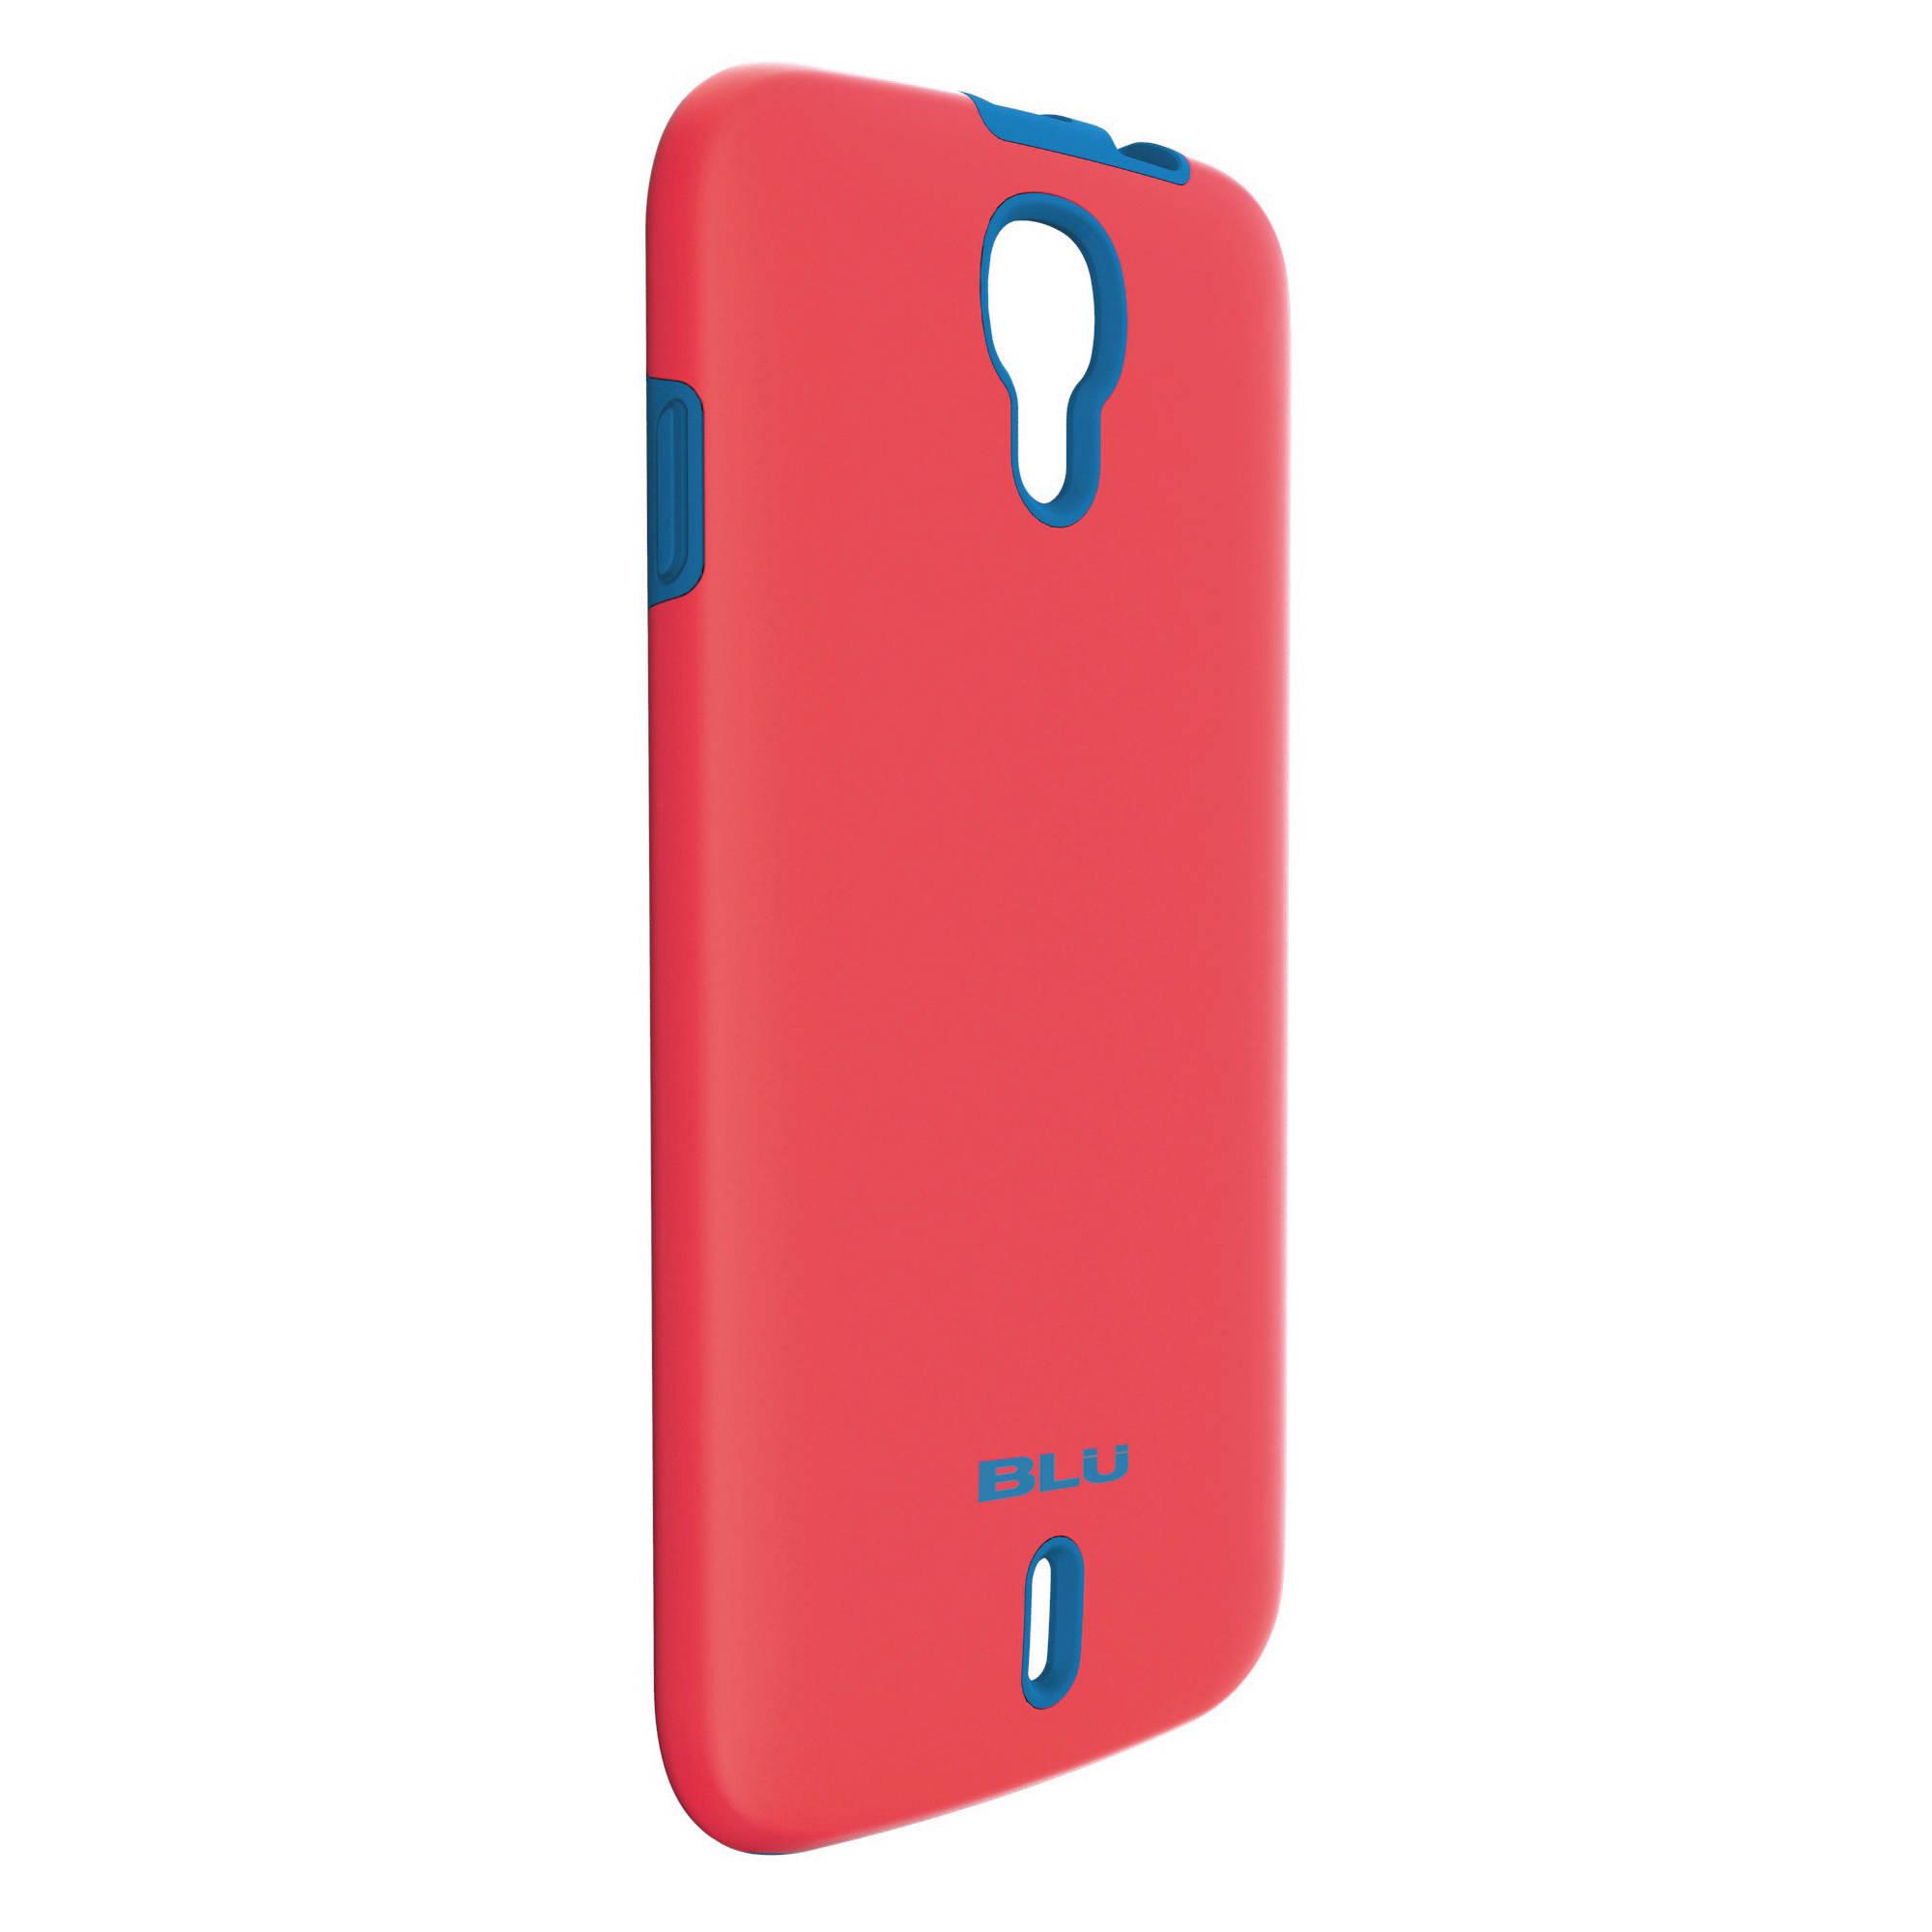 finest selection 31544 58aff BLU Armorflex Case for Studio 6.0 HD (Pink/Blue)